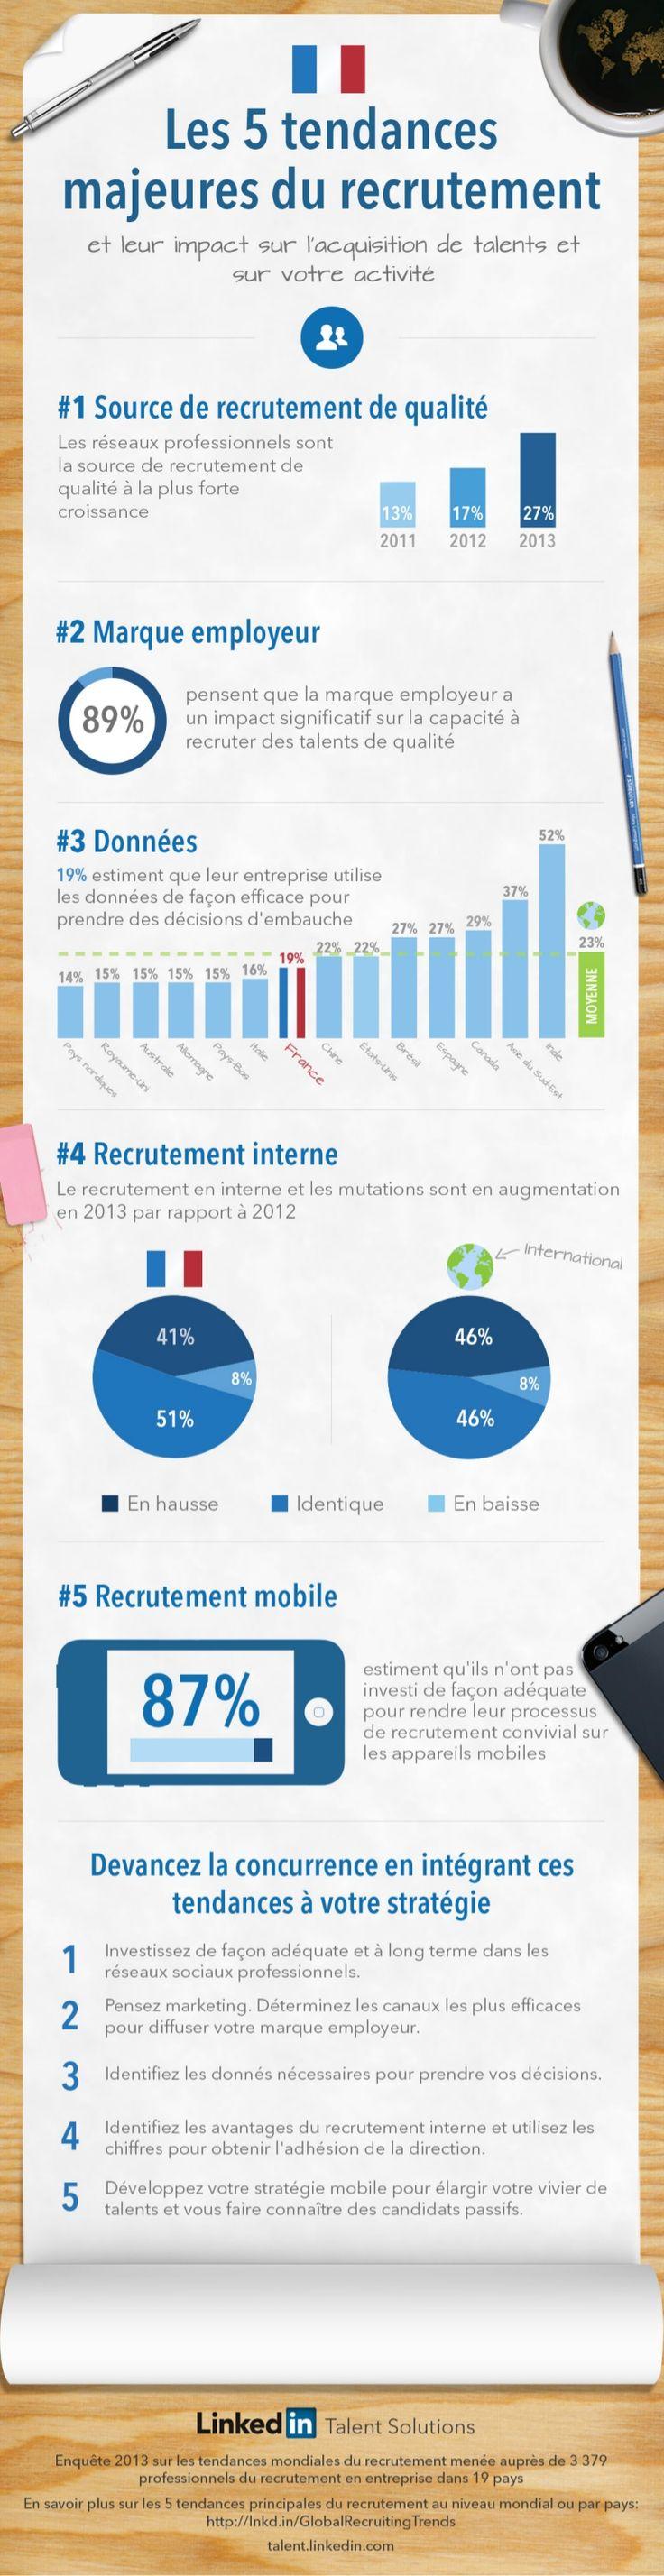 infographie-24805681 by LinkedIn France via Slideshare